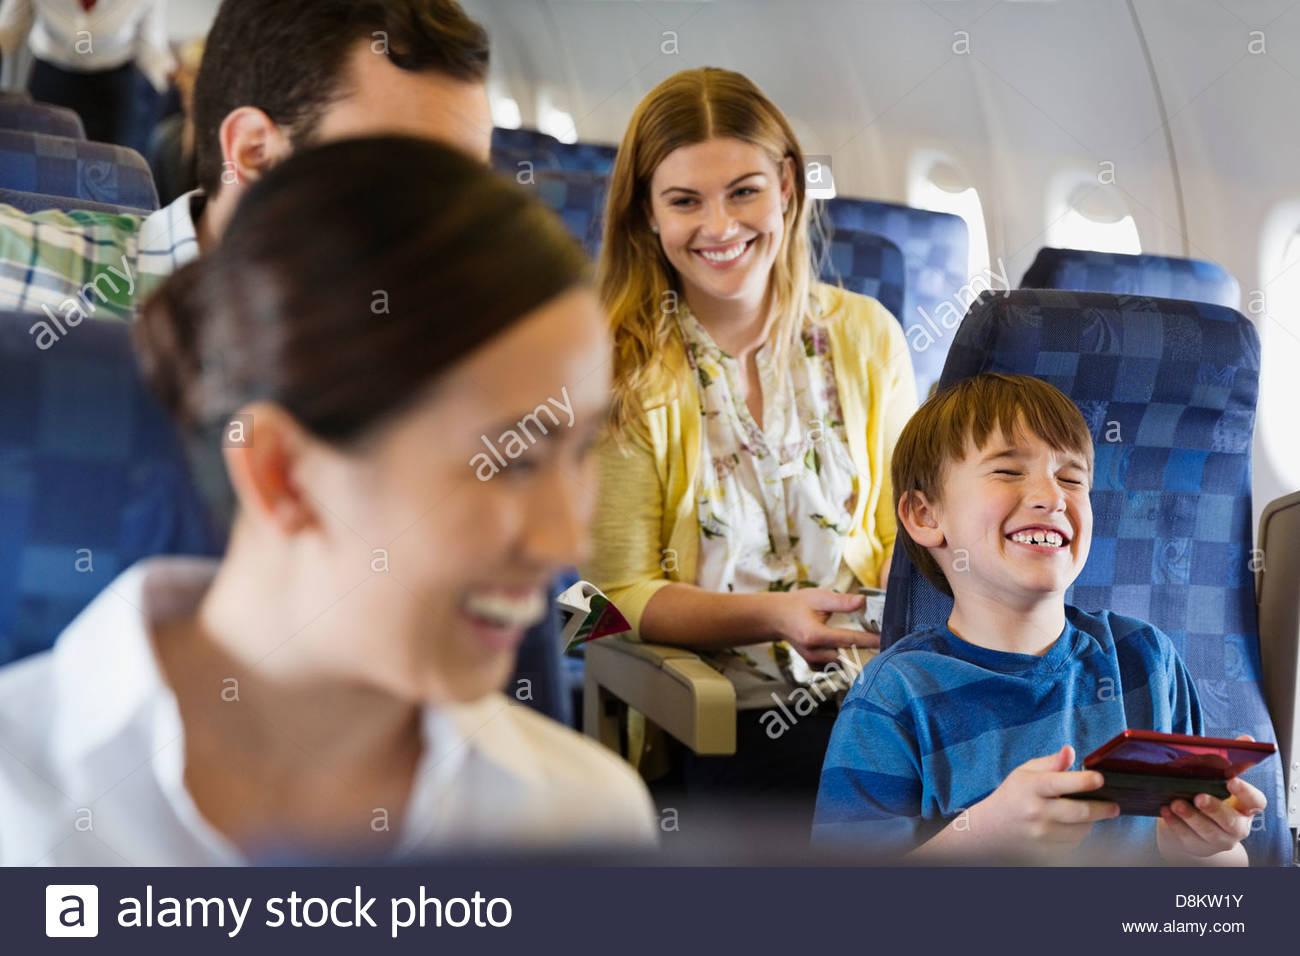 Cheerful passengers traveling in airplane - Stock Image